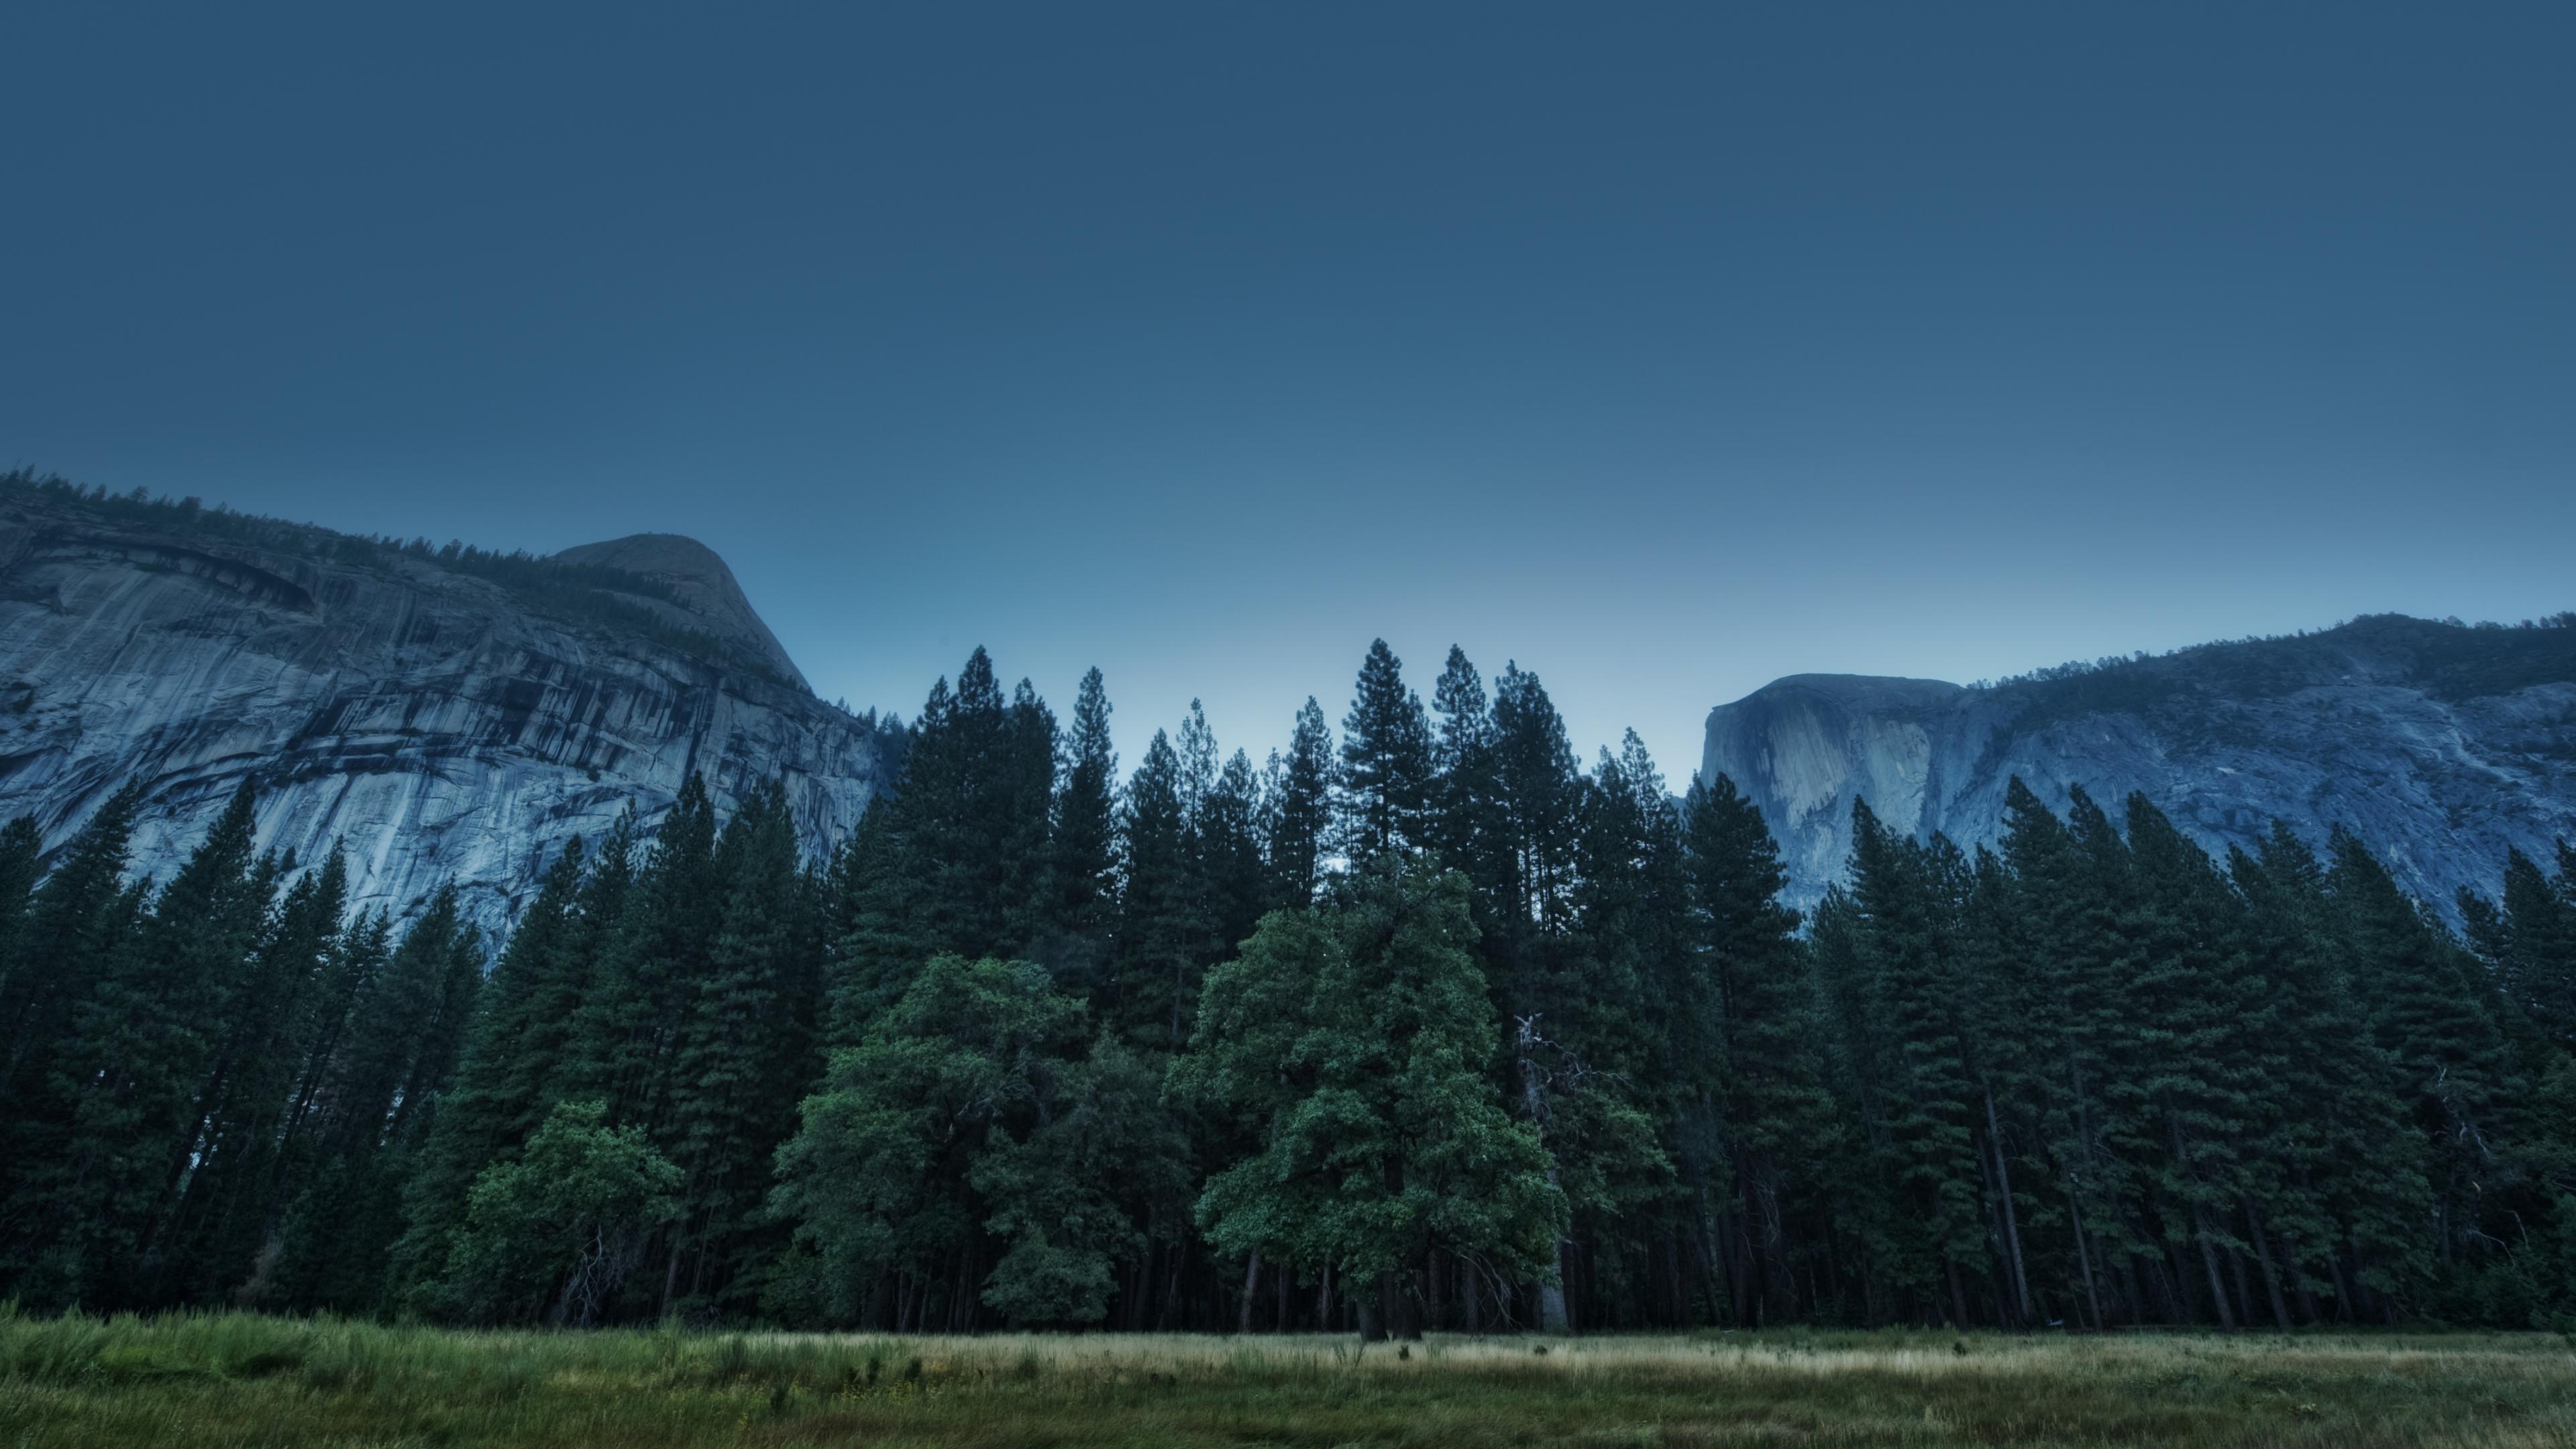 4k mountain wallpaper - photo #16